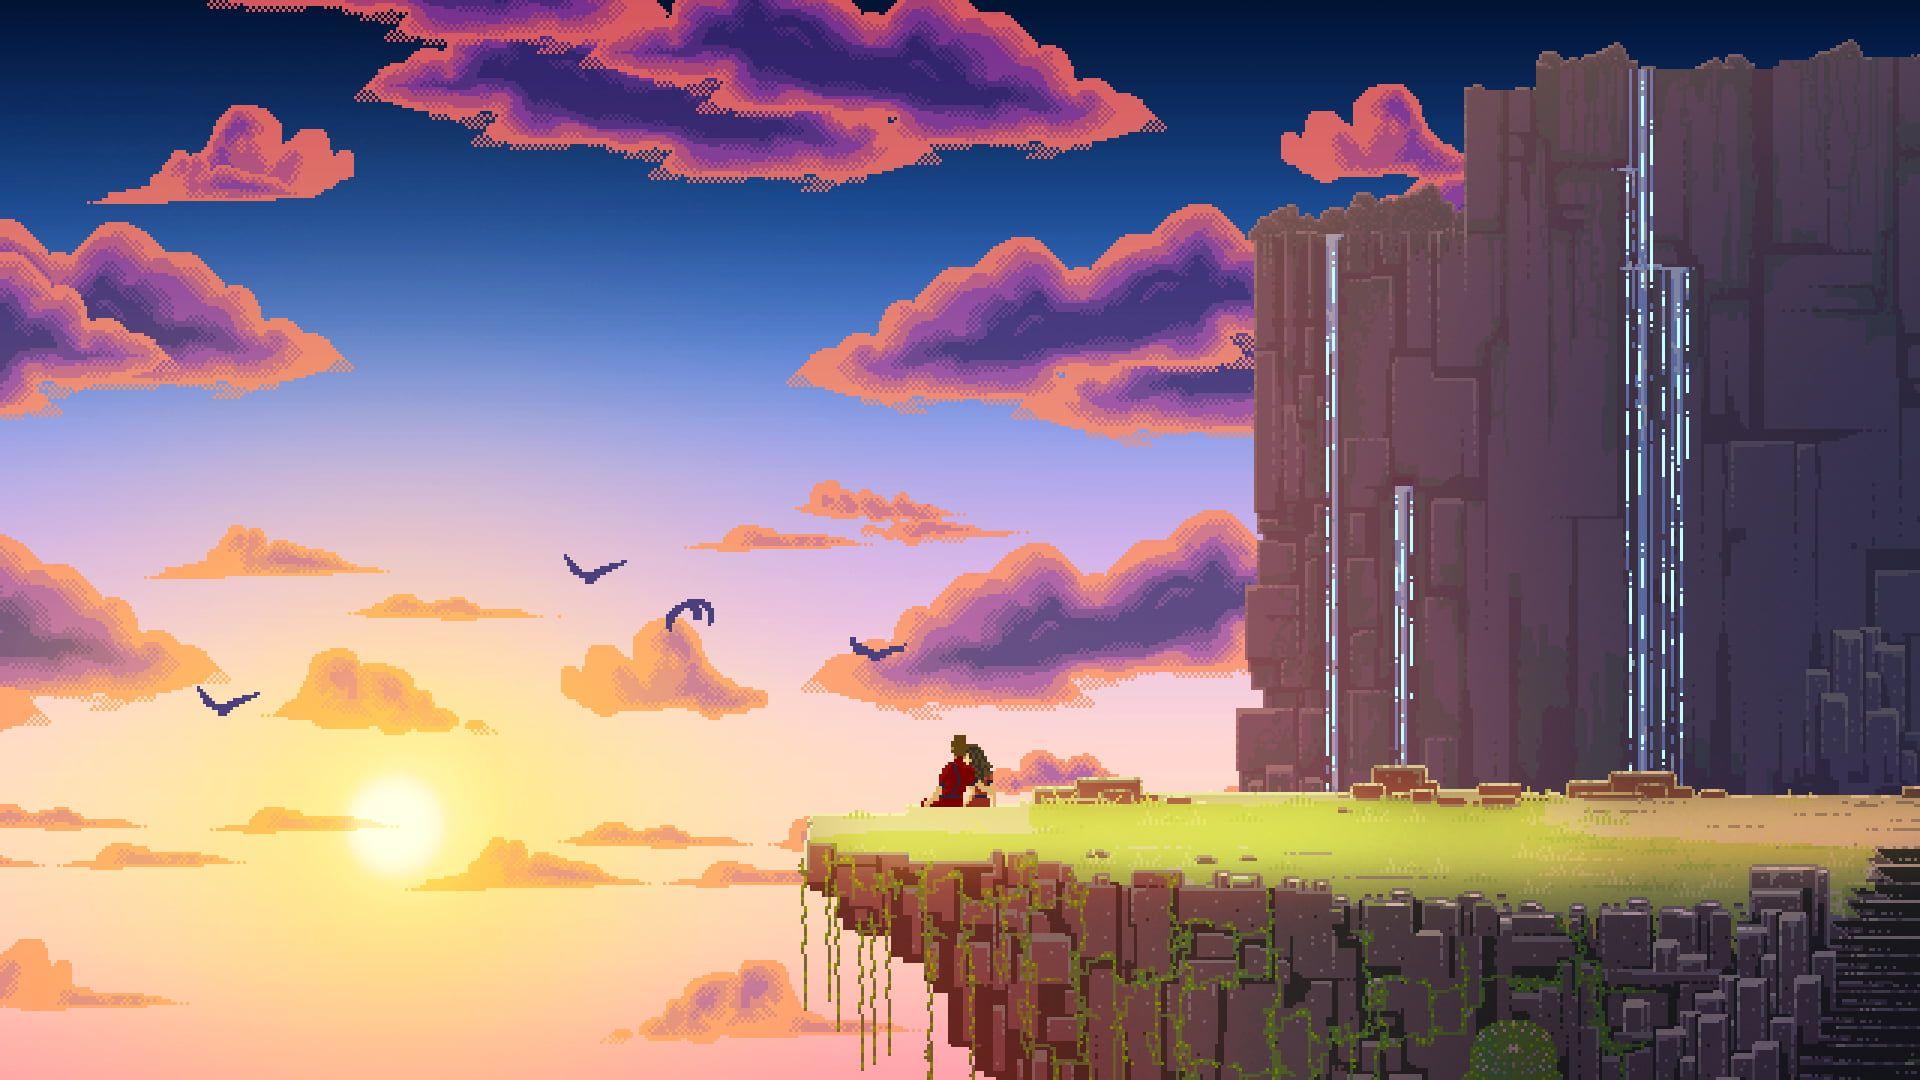 Floating Land Digital Wallpaper Digital Art Pixel Art Pixels Landscape Nature Couple Clouds Birds Wa In 2020 Pixel Art Landscape Desktop Wallpaper Art Pixel Art